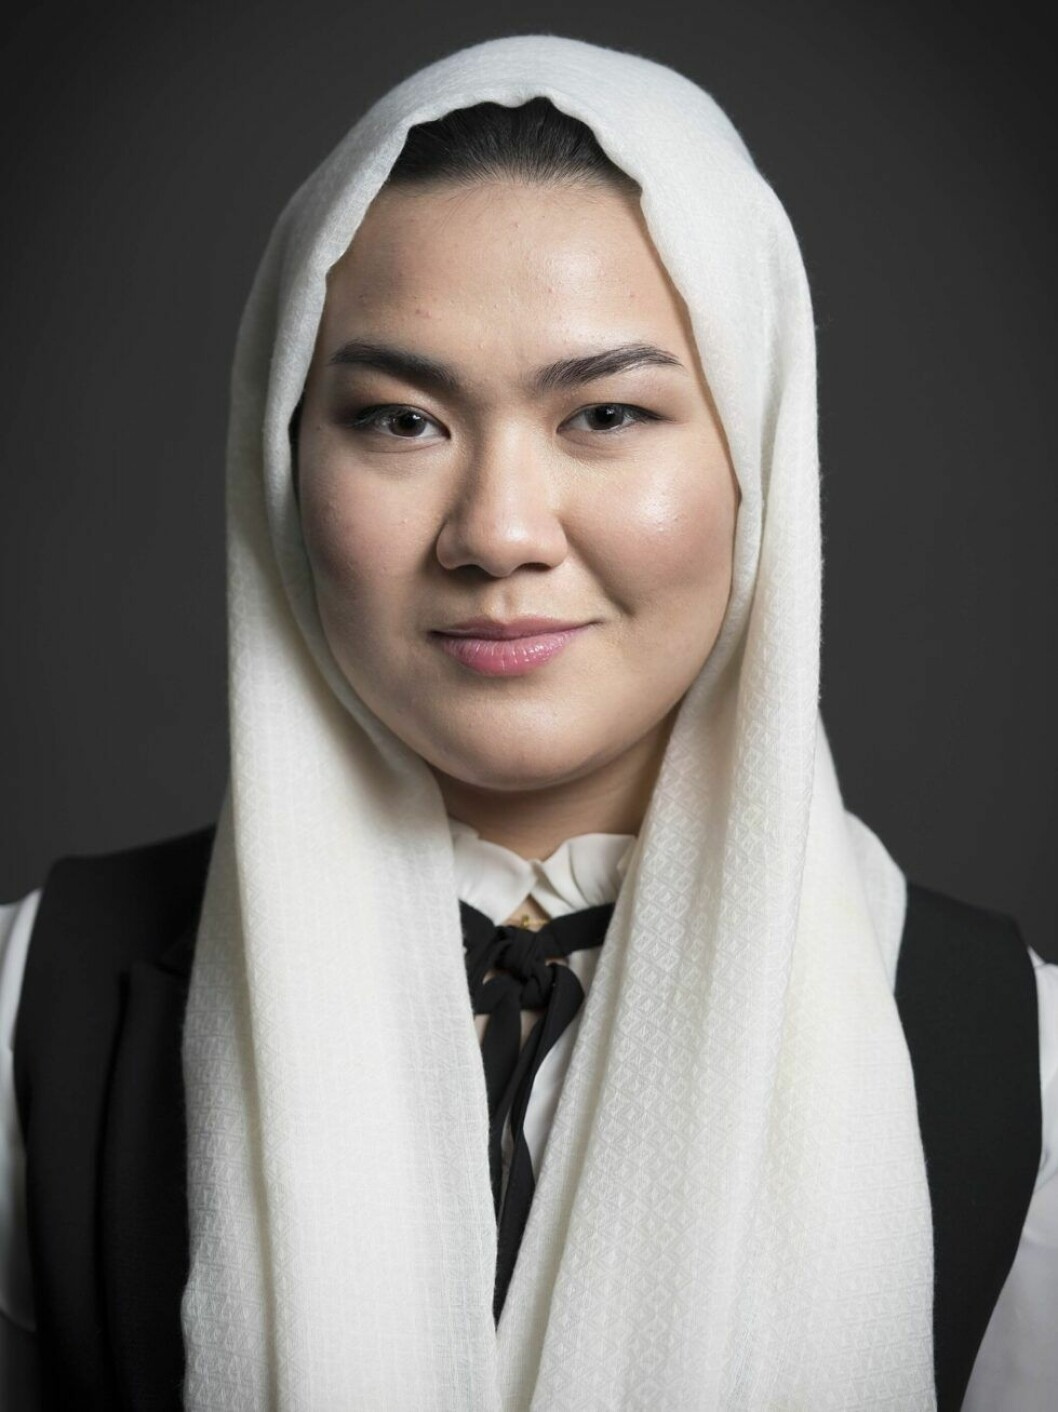 Fatemeh Khavari intervju